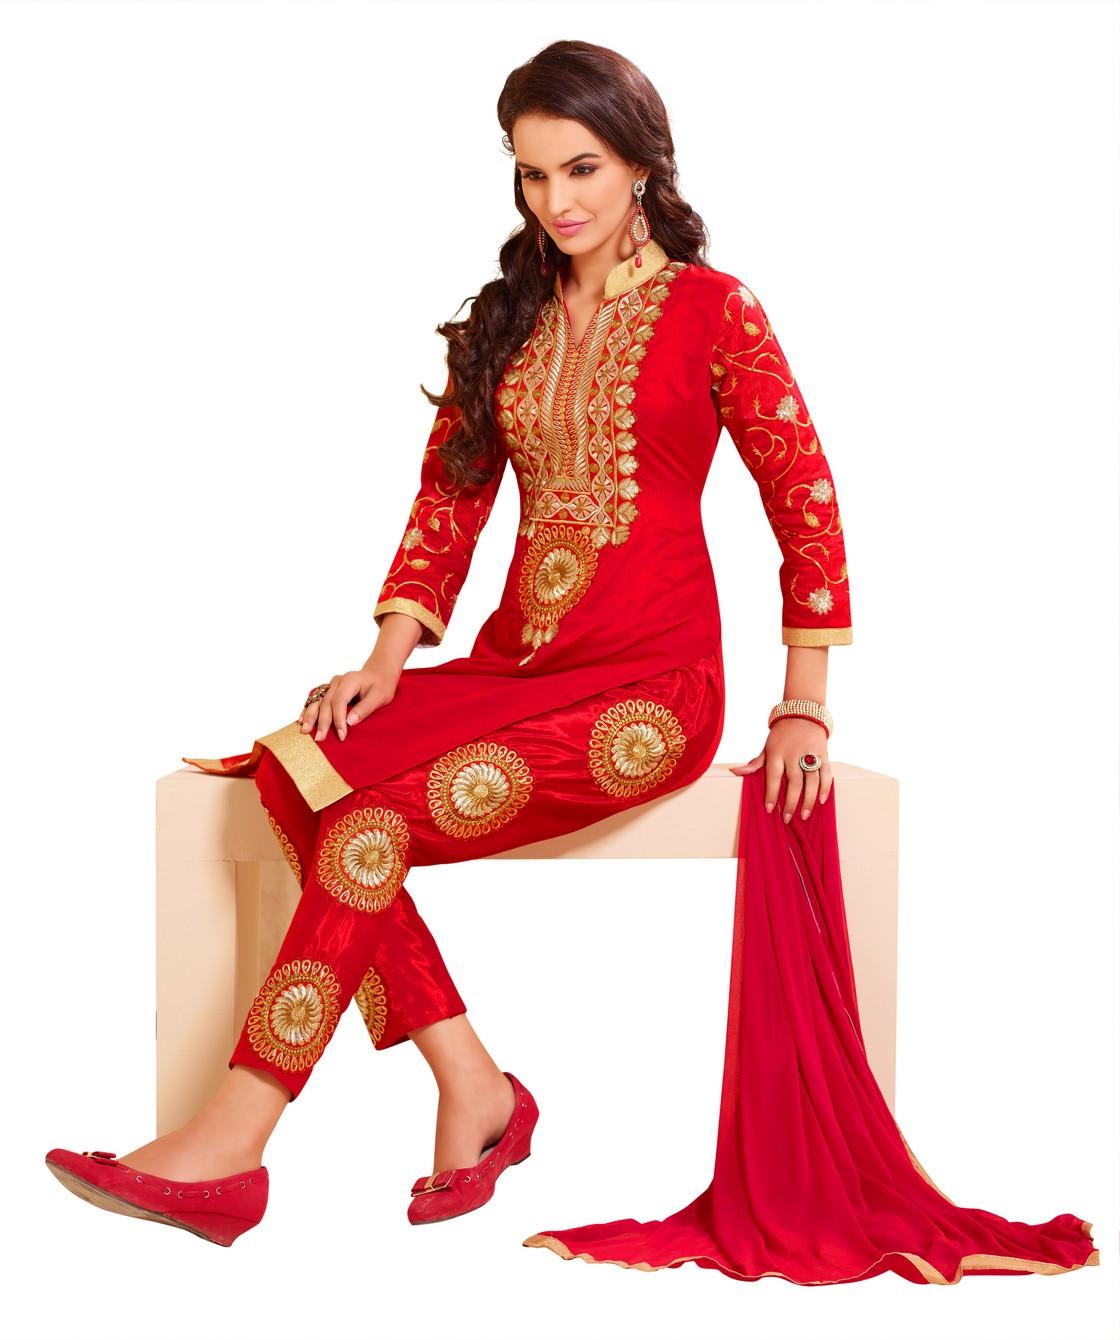 b3d5a01b0 Women Red chanderi embroidered unstitched salwar kameez with dupatta -  DnVeens - 1565006